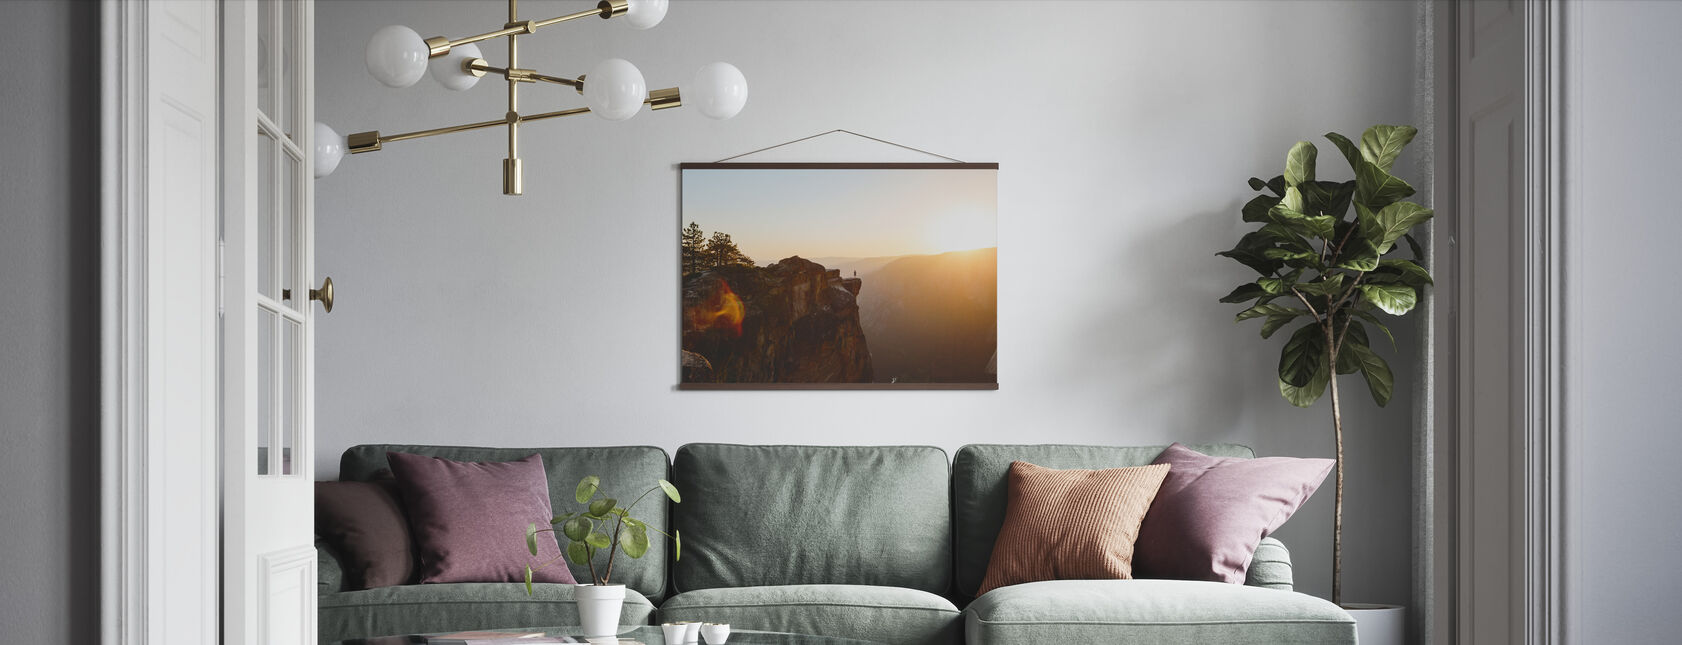 Taft Point, Yosemite National Park - Poster - Living Room